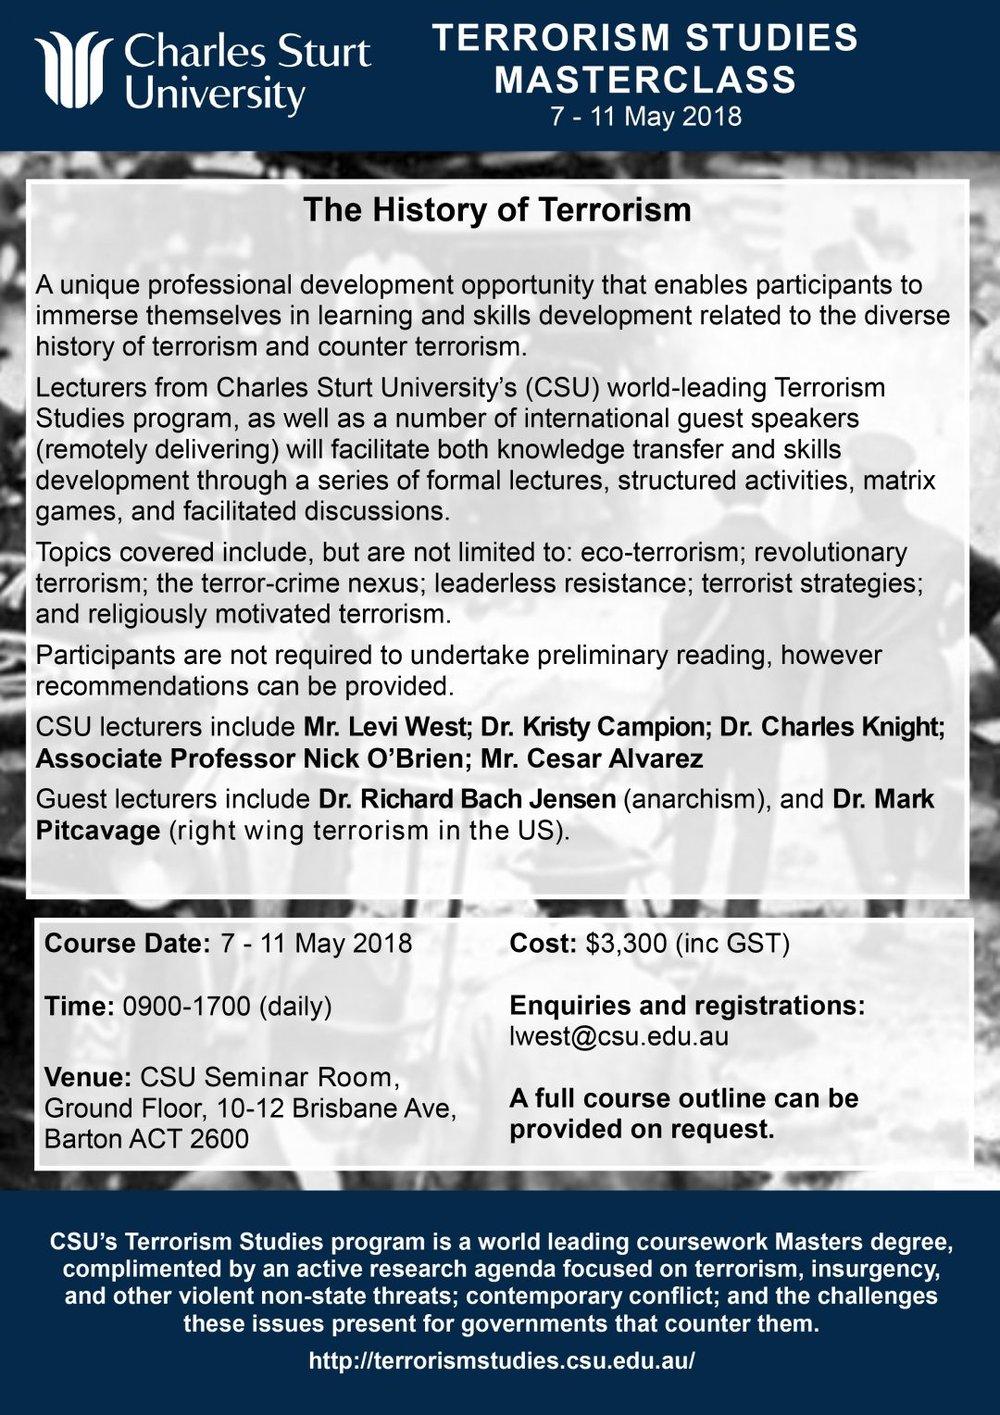 History-of-Terrorism-Masterclass-07-11-May-1080x1528.jpg